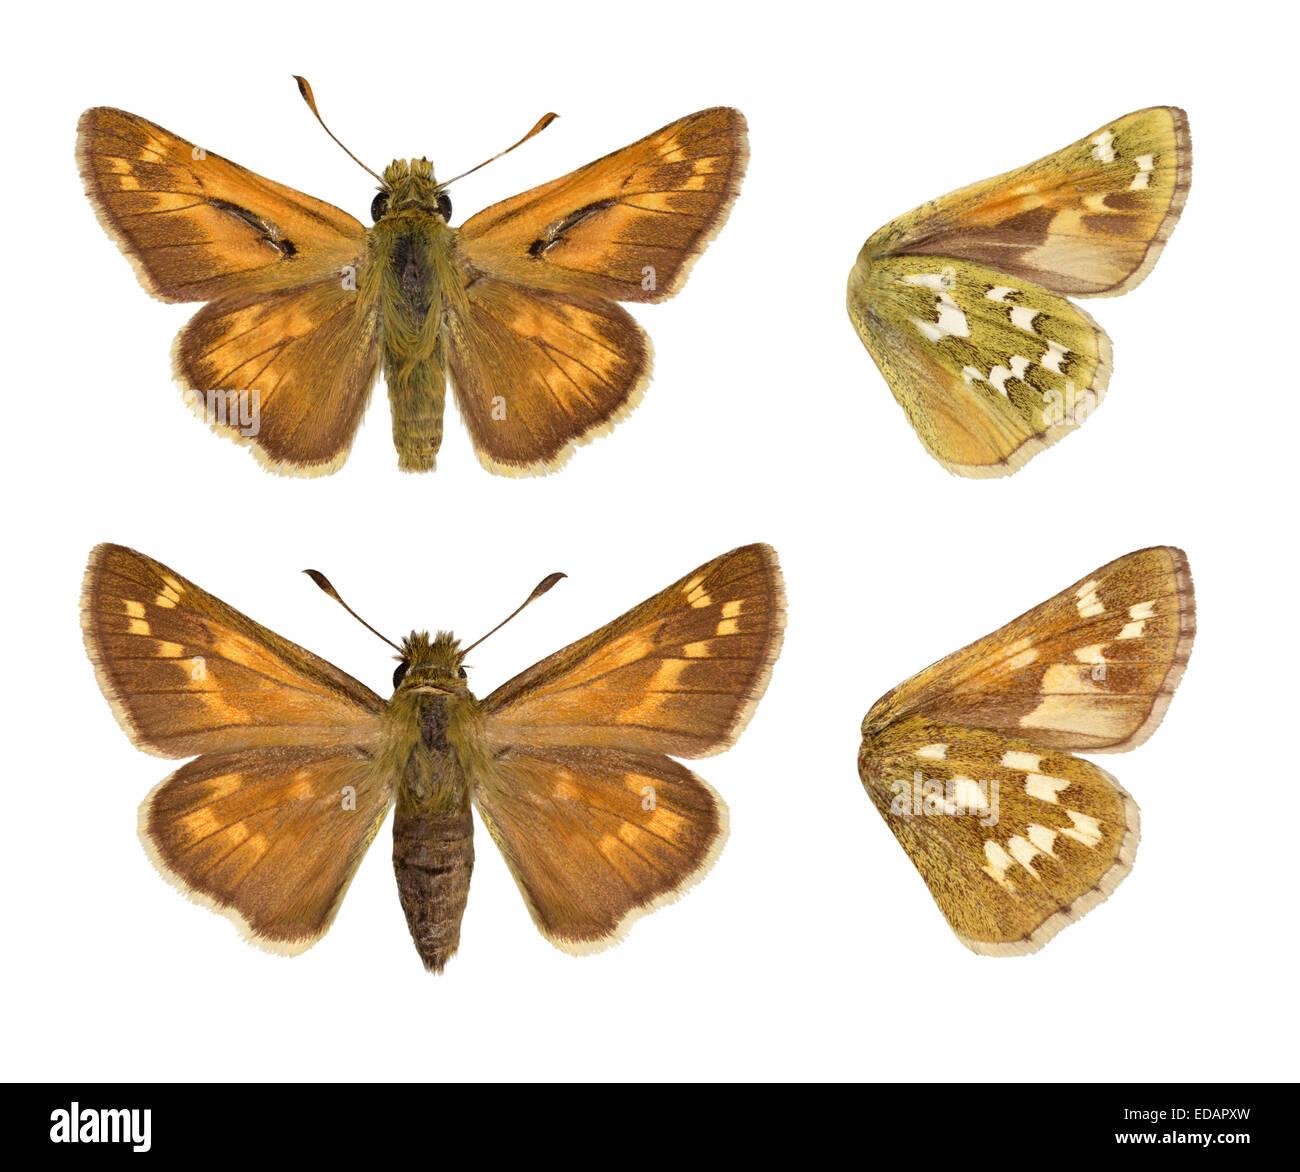 Silver-spotted Skipper - Hesperia comma - (male - top, female - bottom). - Stock Image